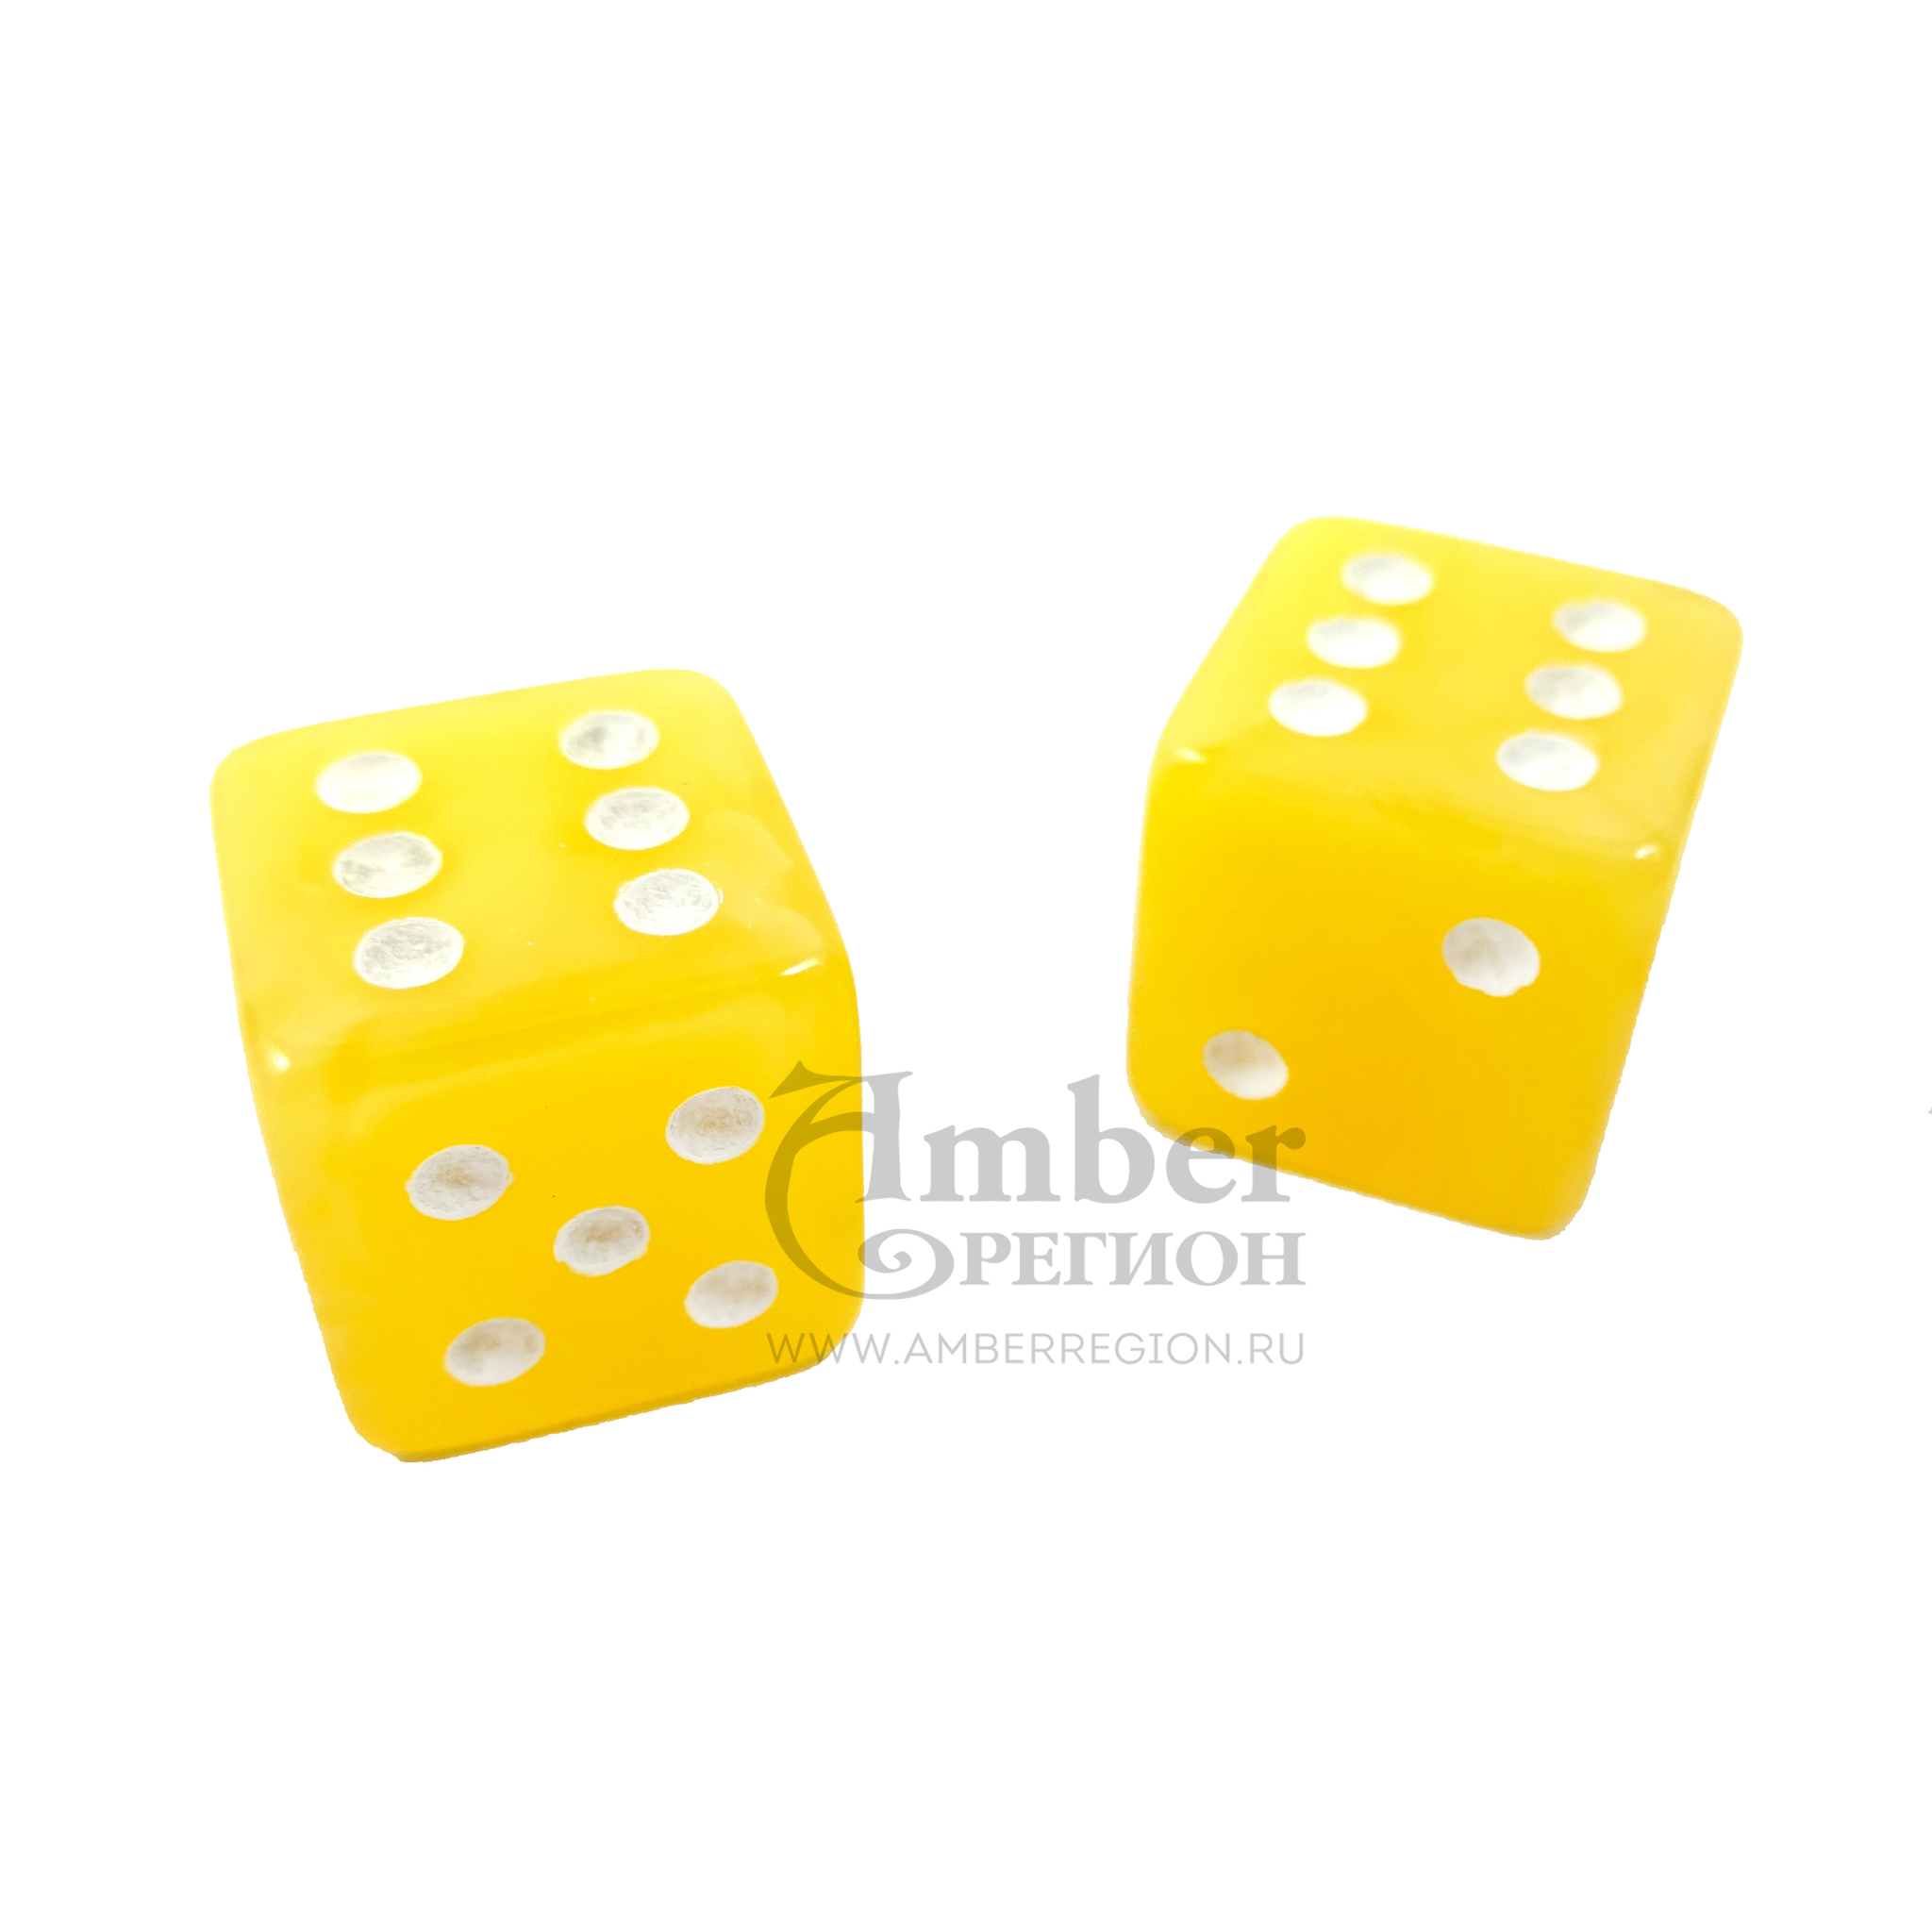 Янтарный кубик (матовый желтый)